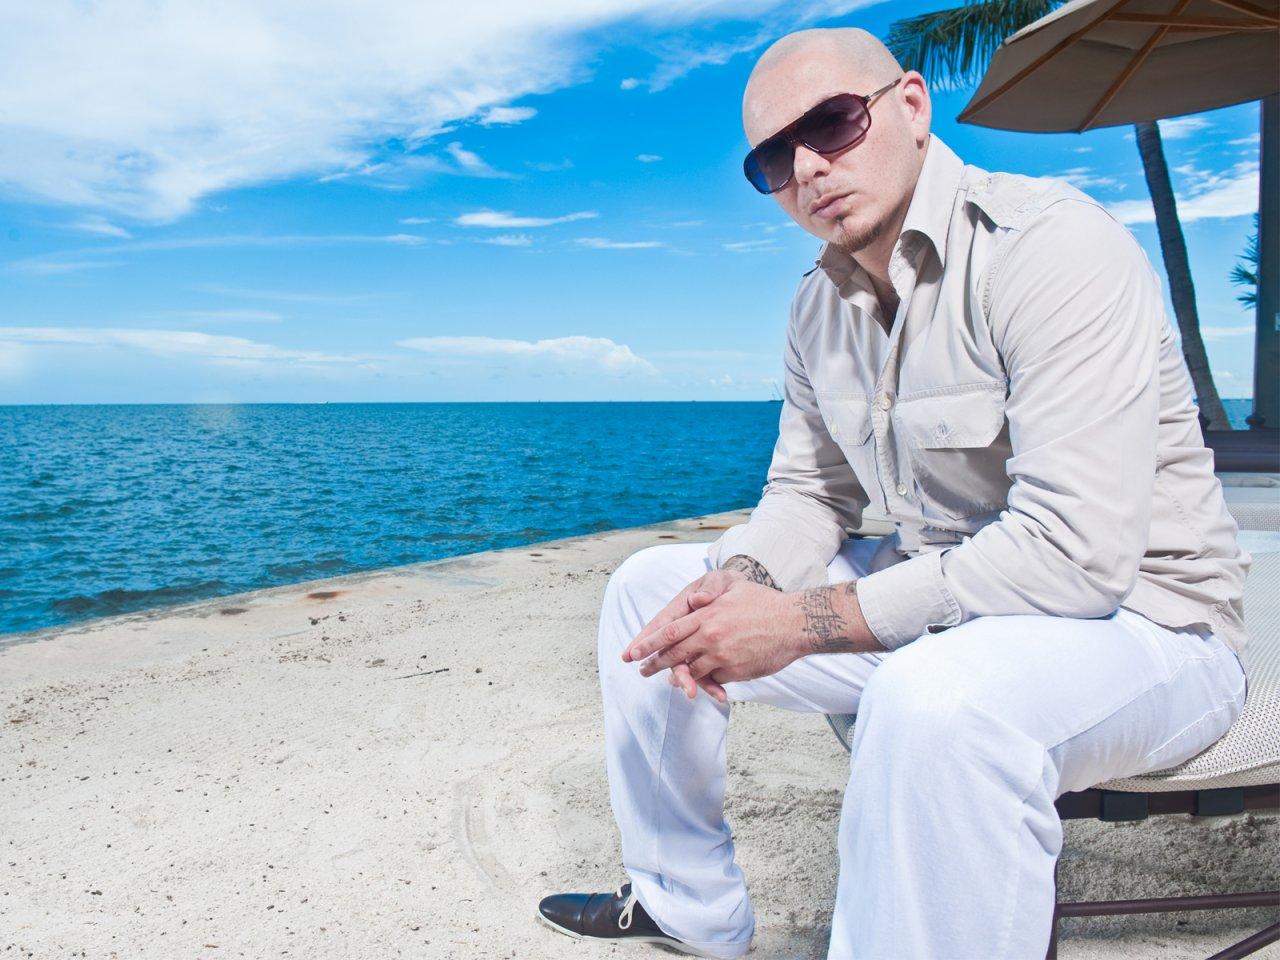 Pitbull Brings His Miami Yachtwear to Season 2 of 'Empire'